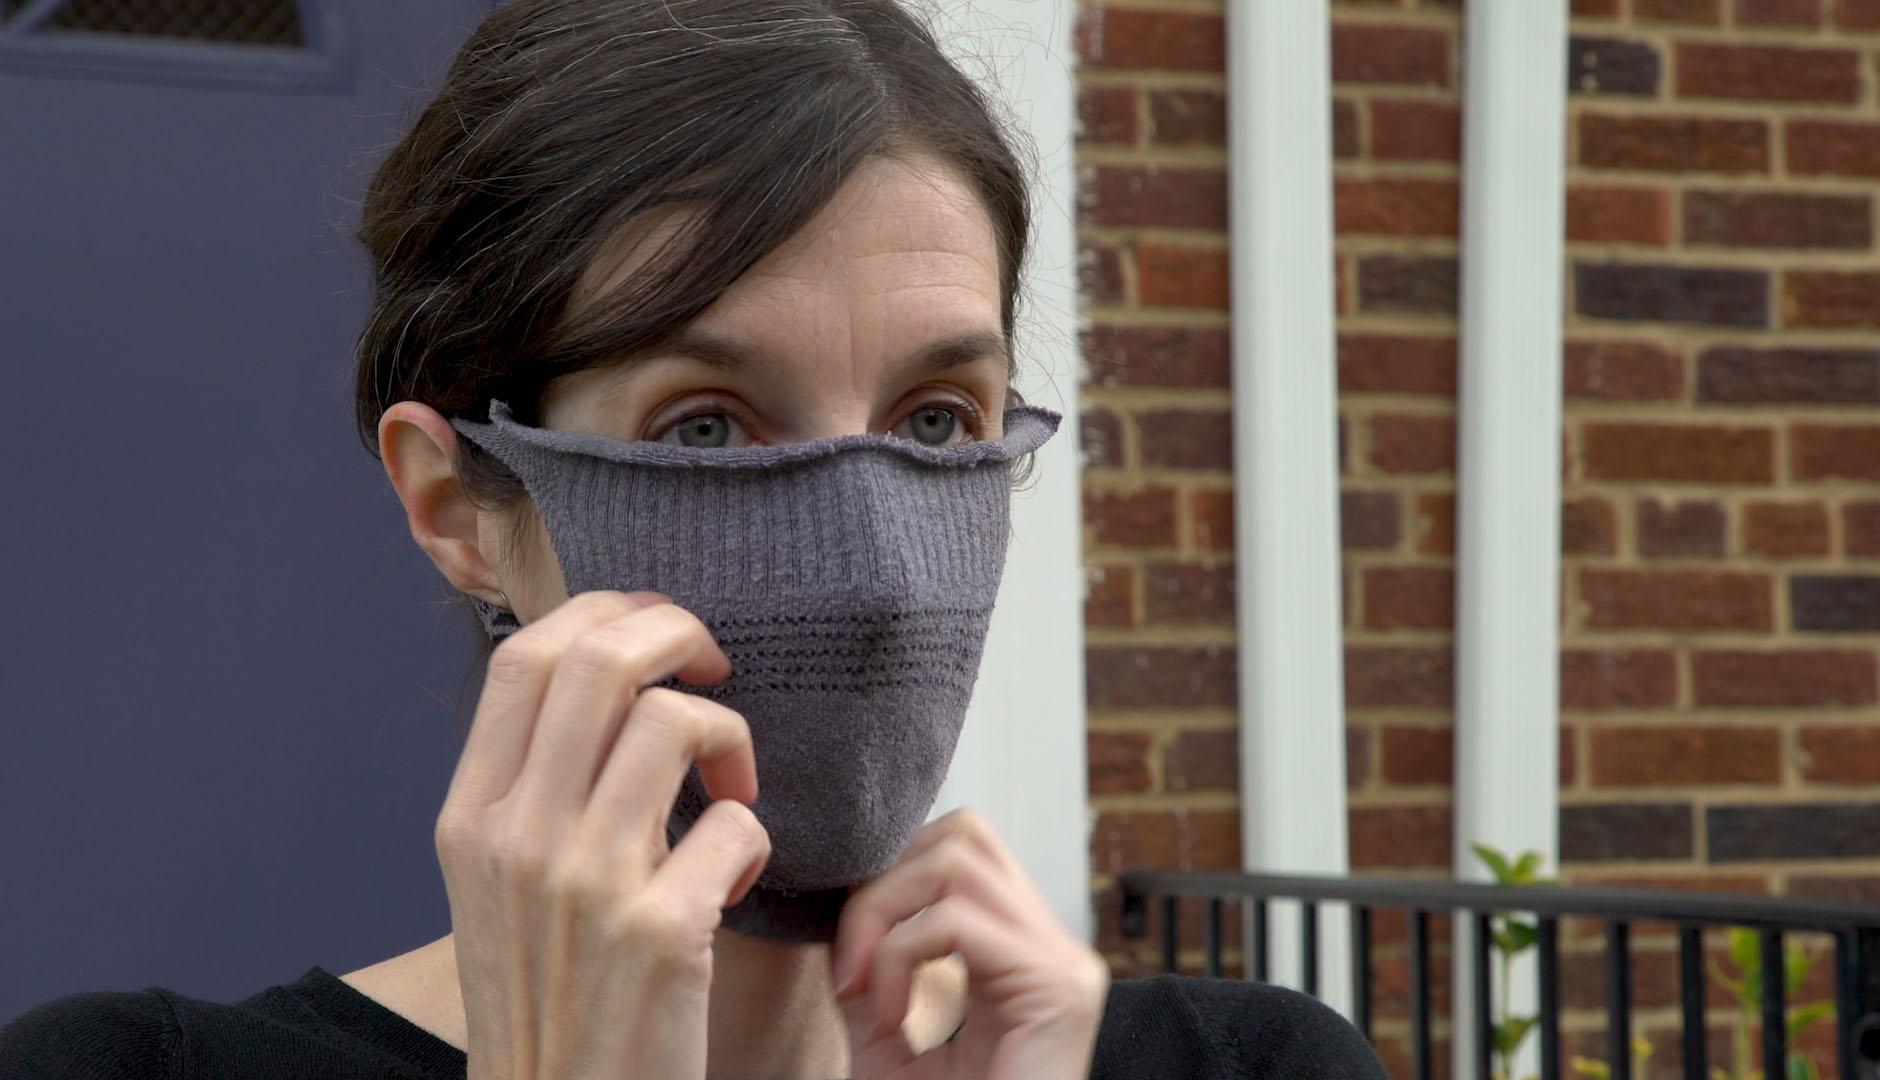 Una mujer se ajusta una mascarilla hecha con una media